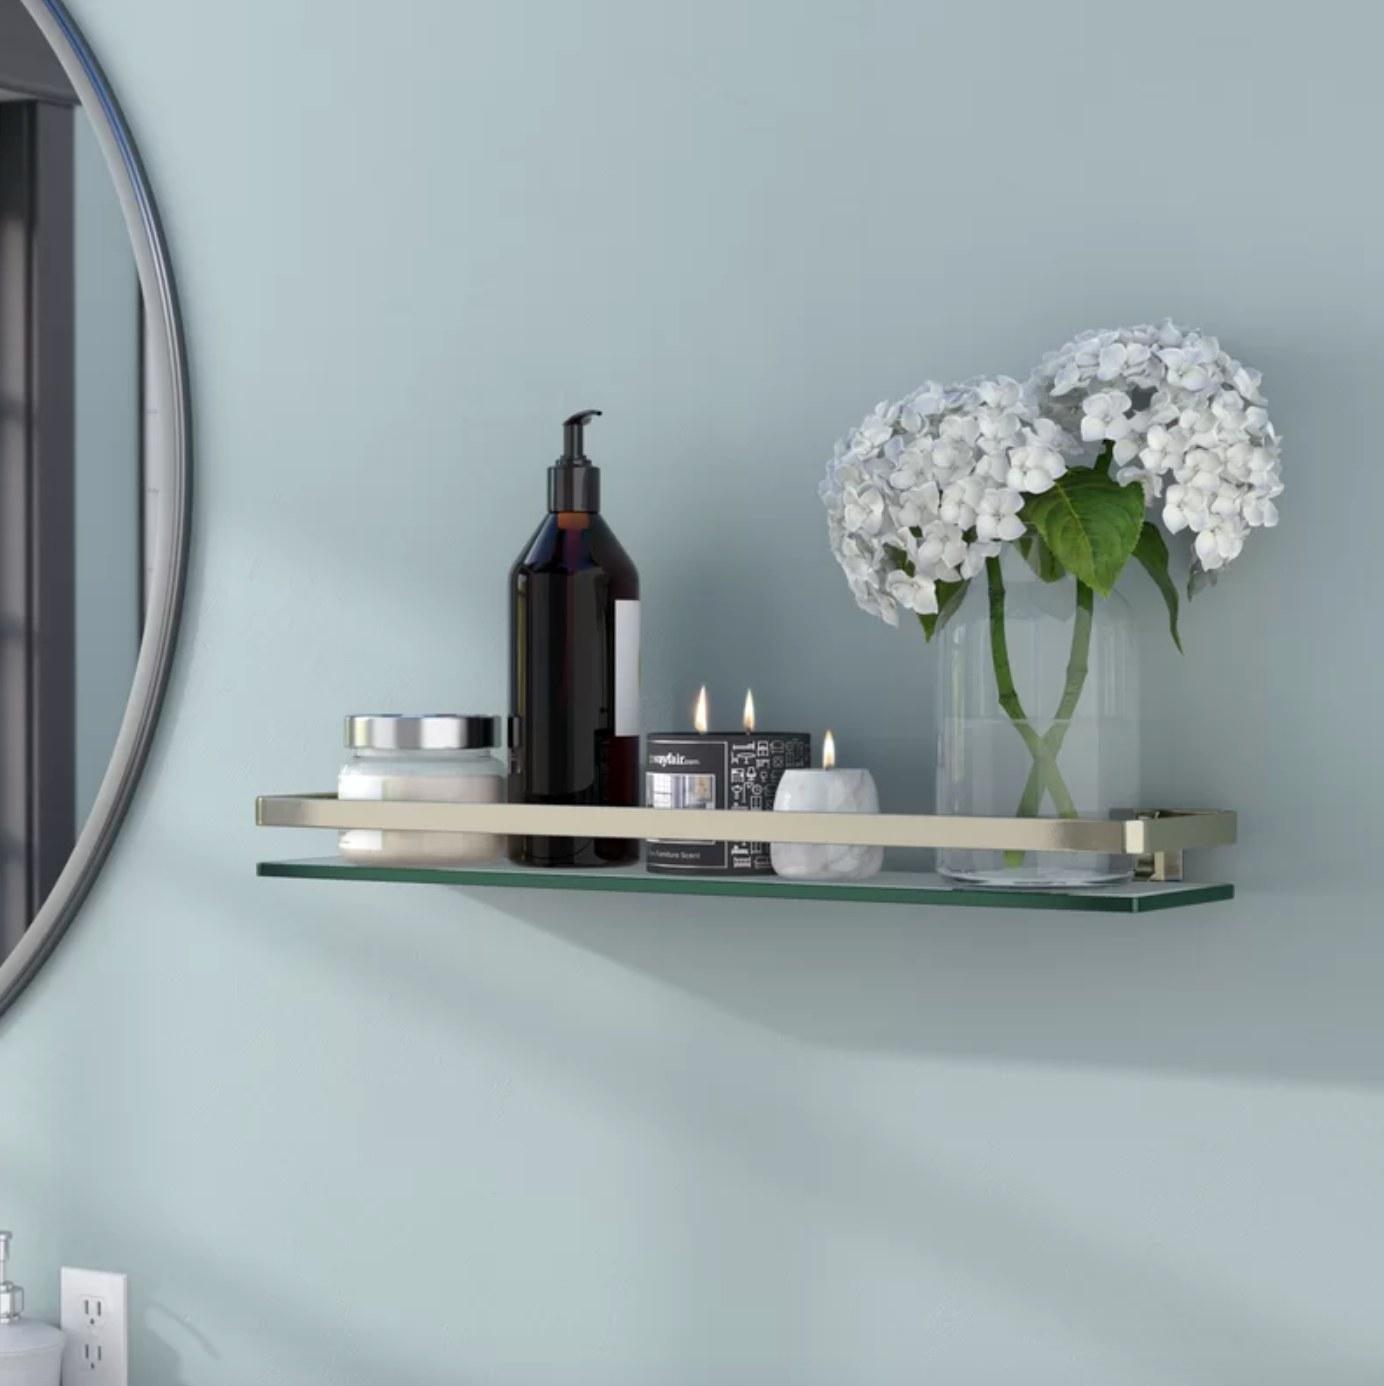 The wall shelf in silver